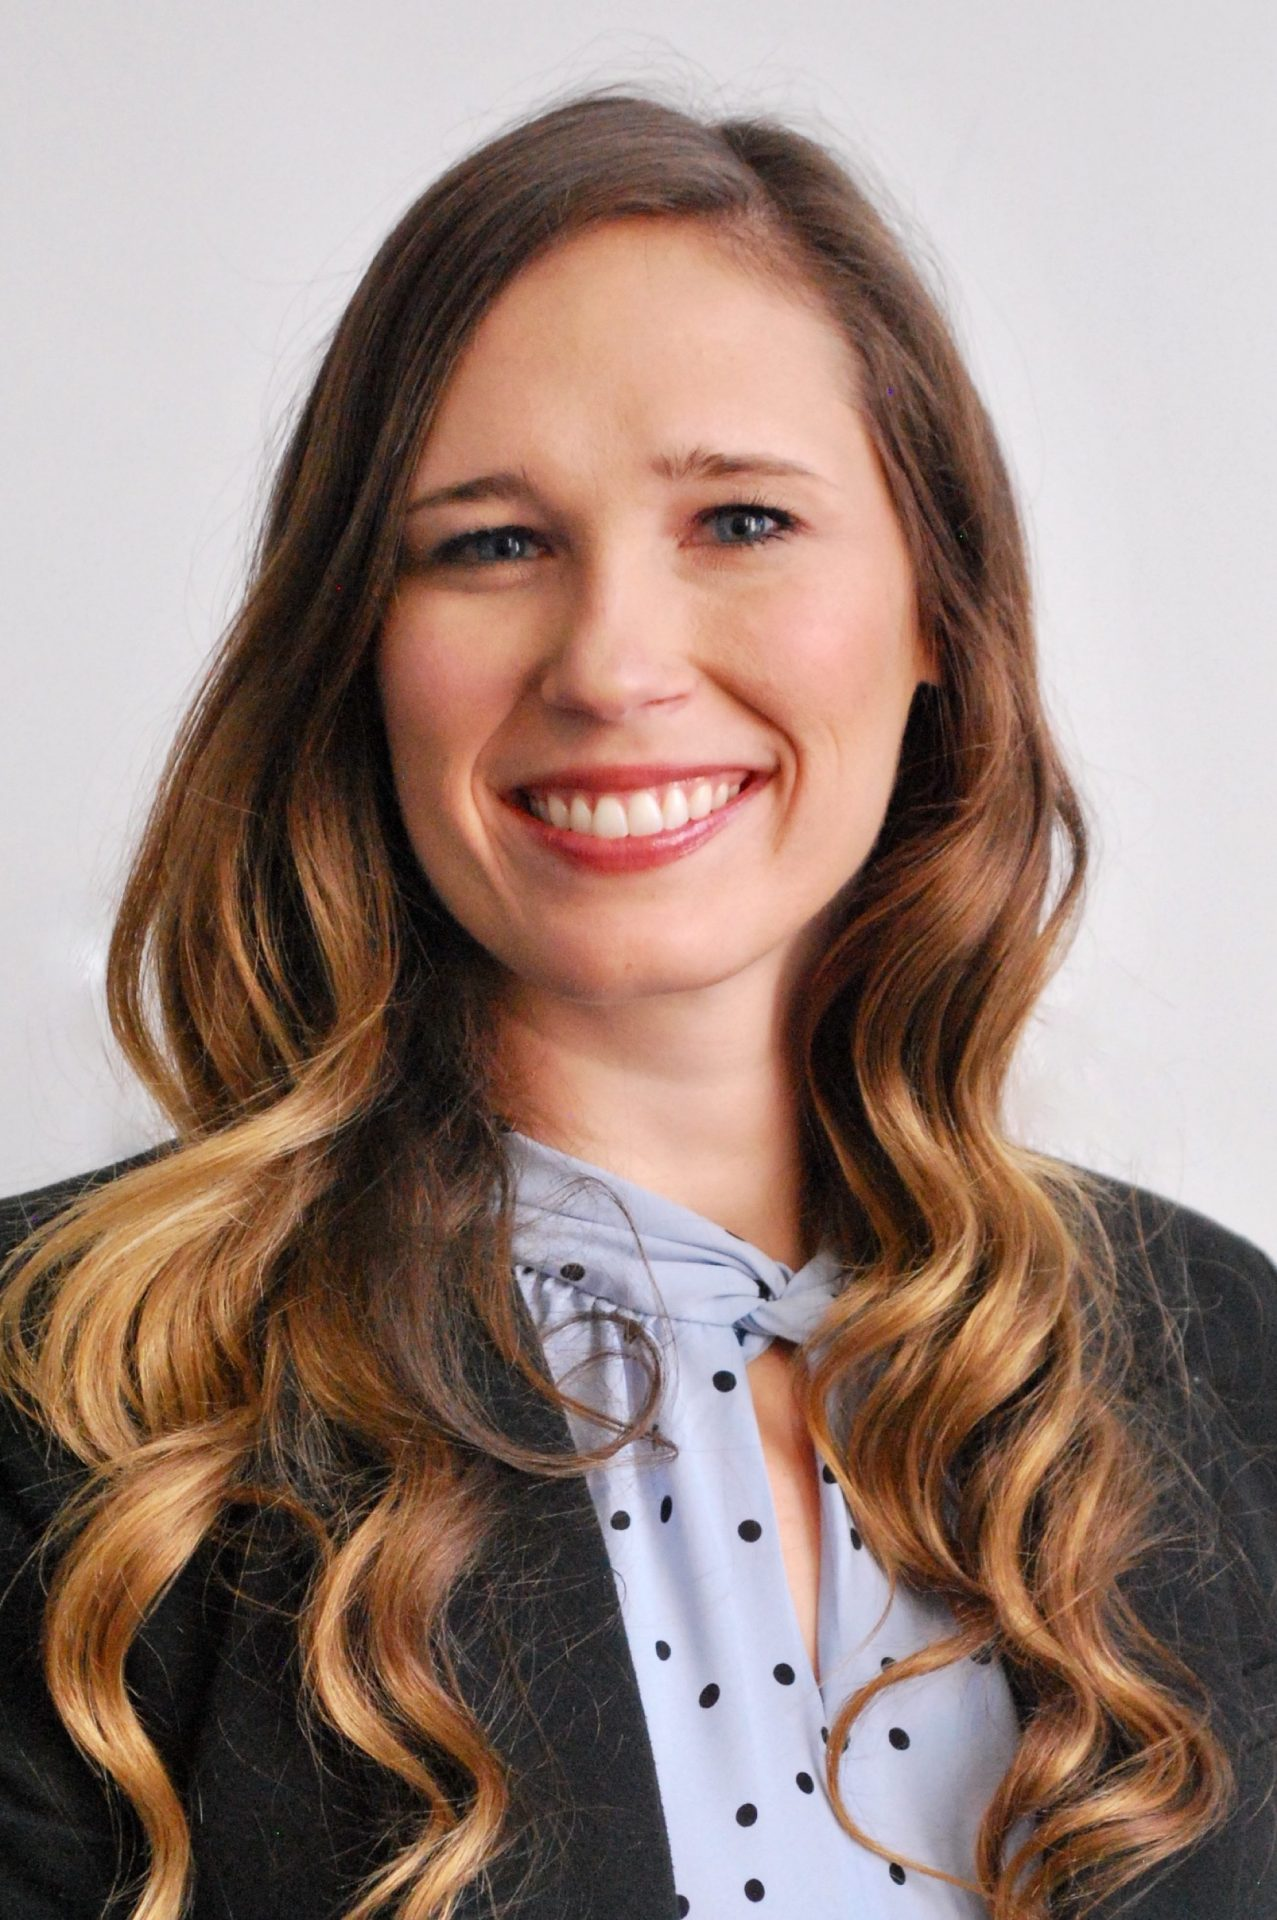 Orthodontist Dr. Cailynn West